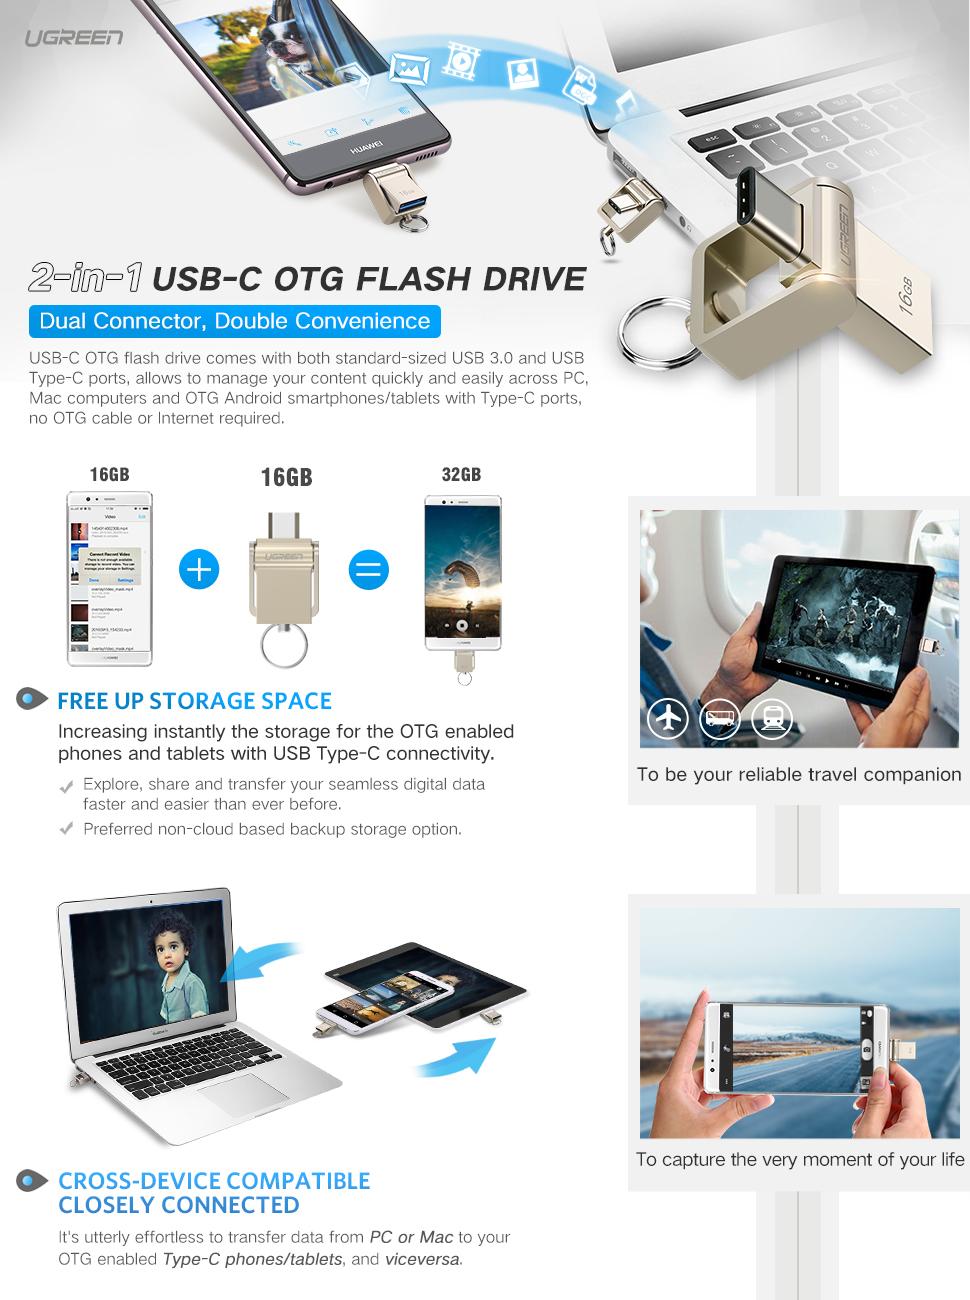 Ugreen Usb 30 Type C Otg Flash Drive For Flashdisk Atau Flashdrive Samsung Original Smartphone And Tabletslike Apples Macbookgoogles Chromebook Pixel Nokia N1 Tablet Etc